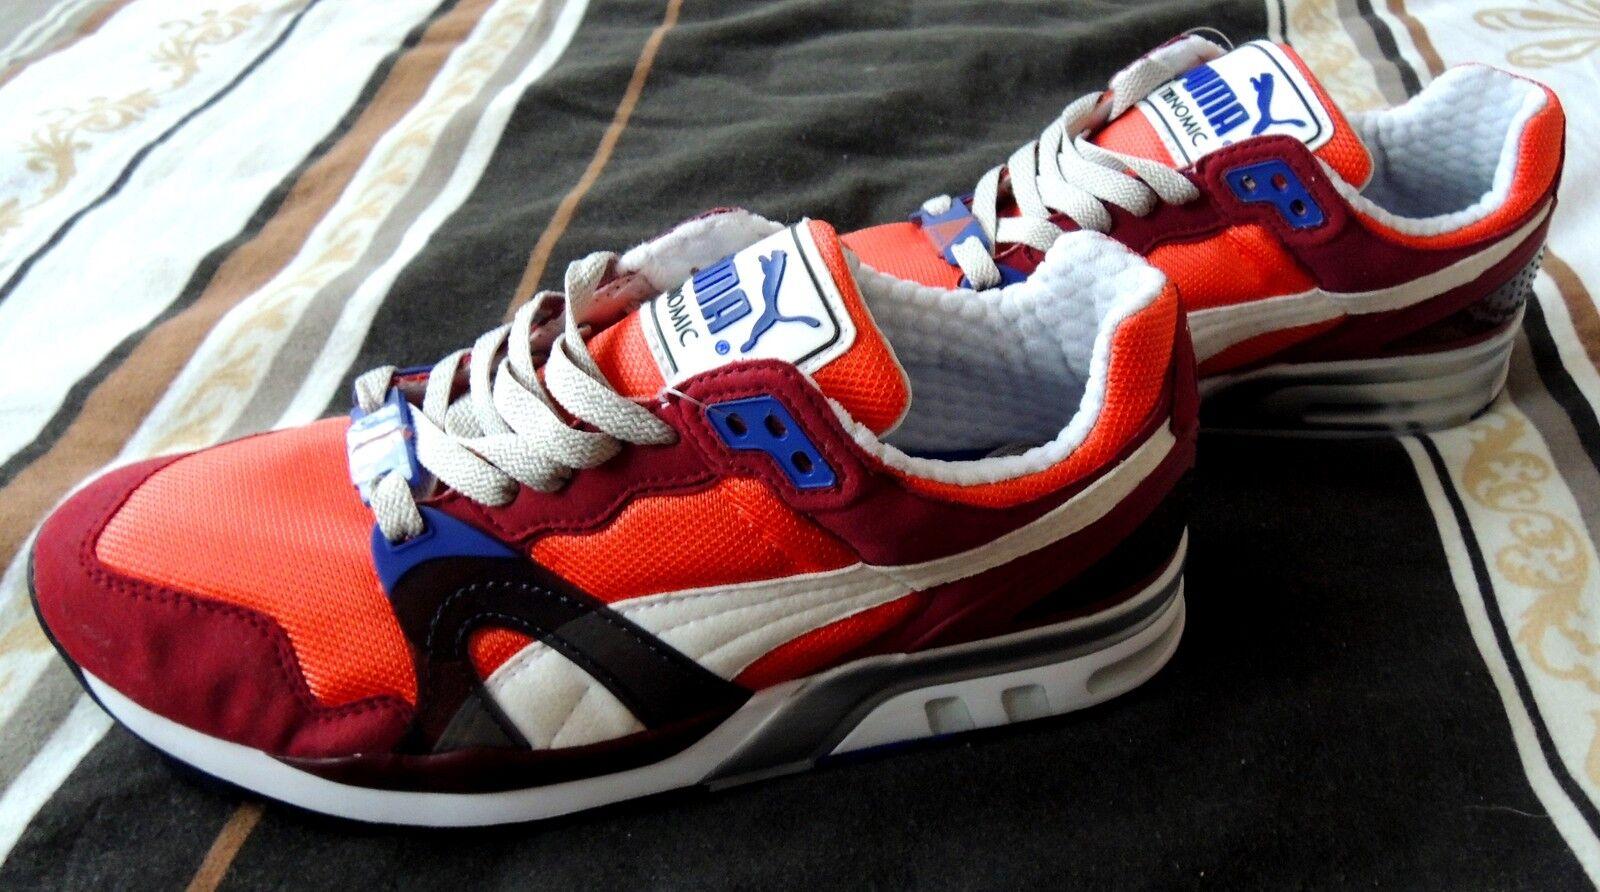 PUMA TRINOMIC XT2 XT2 XT2 Plus MESH Gr. 42 ORIGINAL RUNNING Schuh Sneaker NEU Fashion 3cfc27